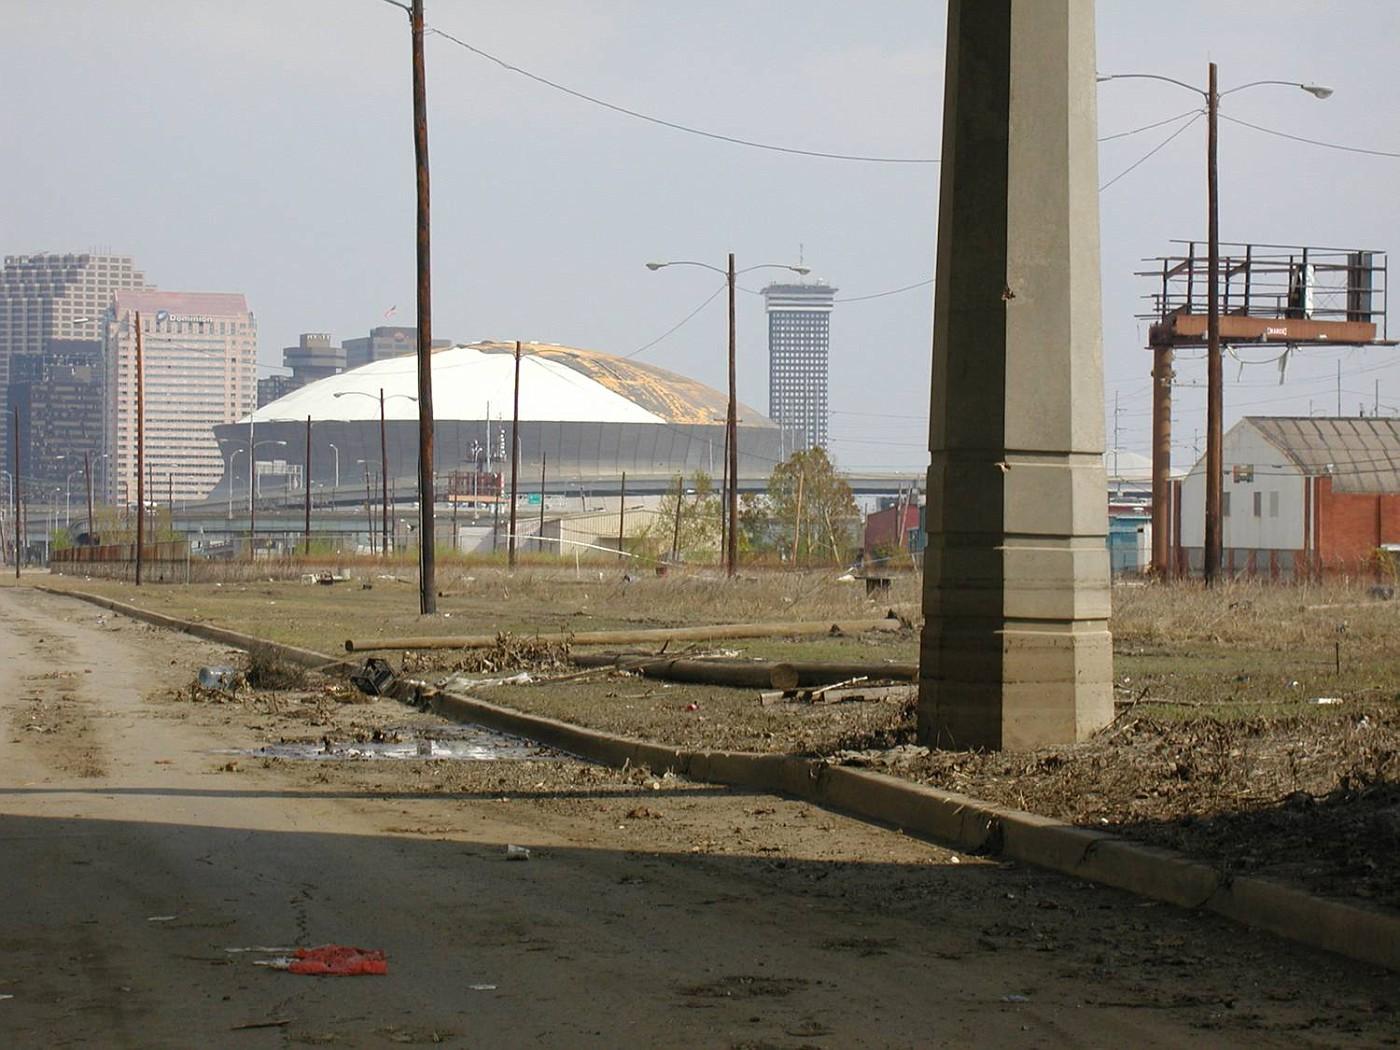 NO Damage to Super Dome